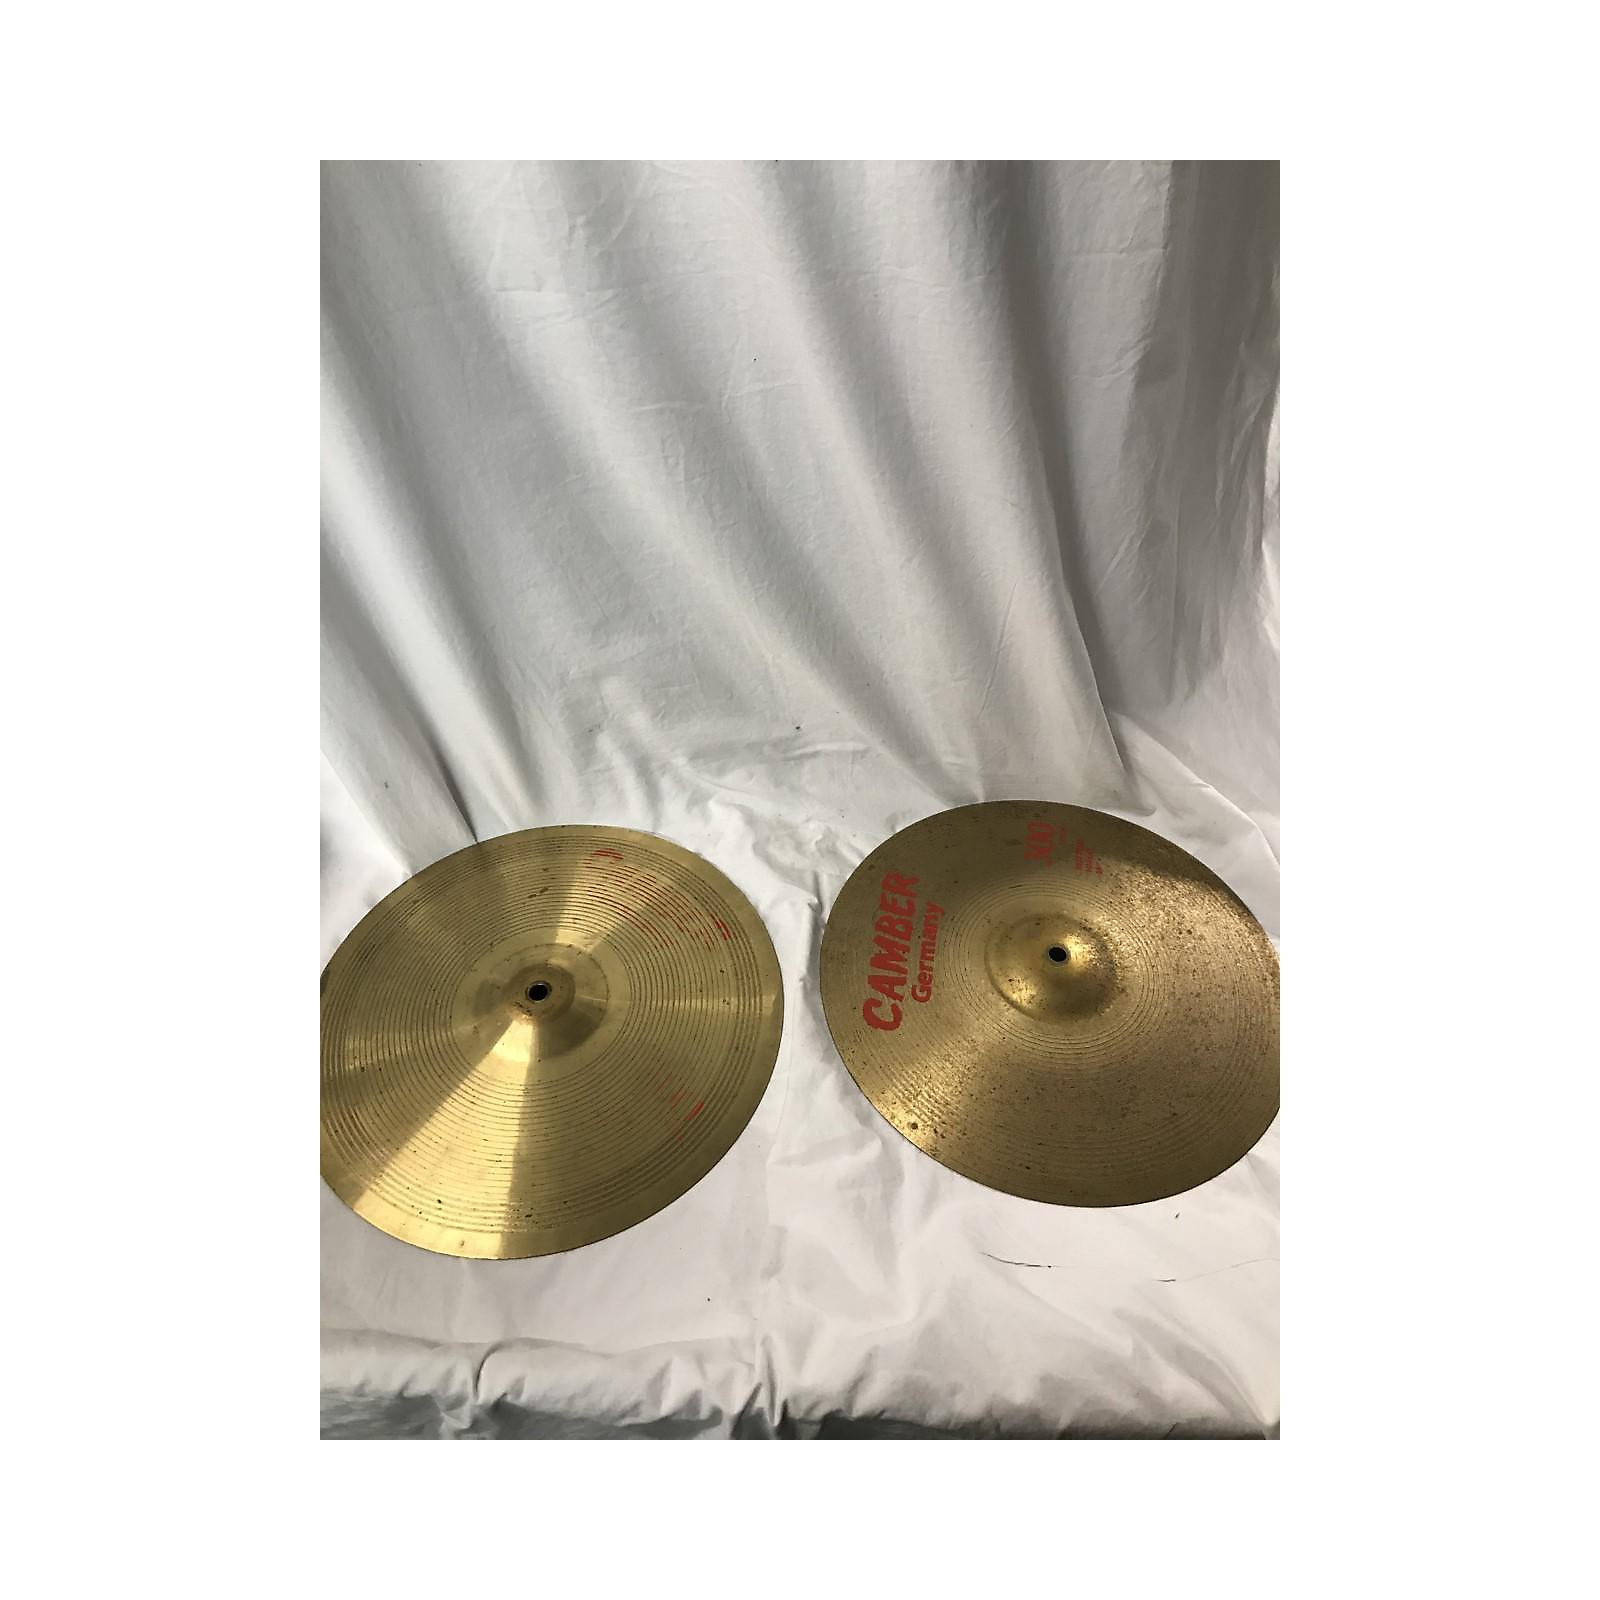 Camber 14in 300 Series Hi Hat Pair Cymbal